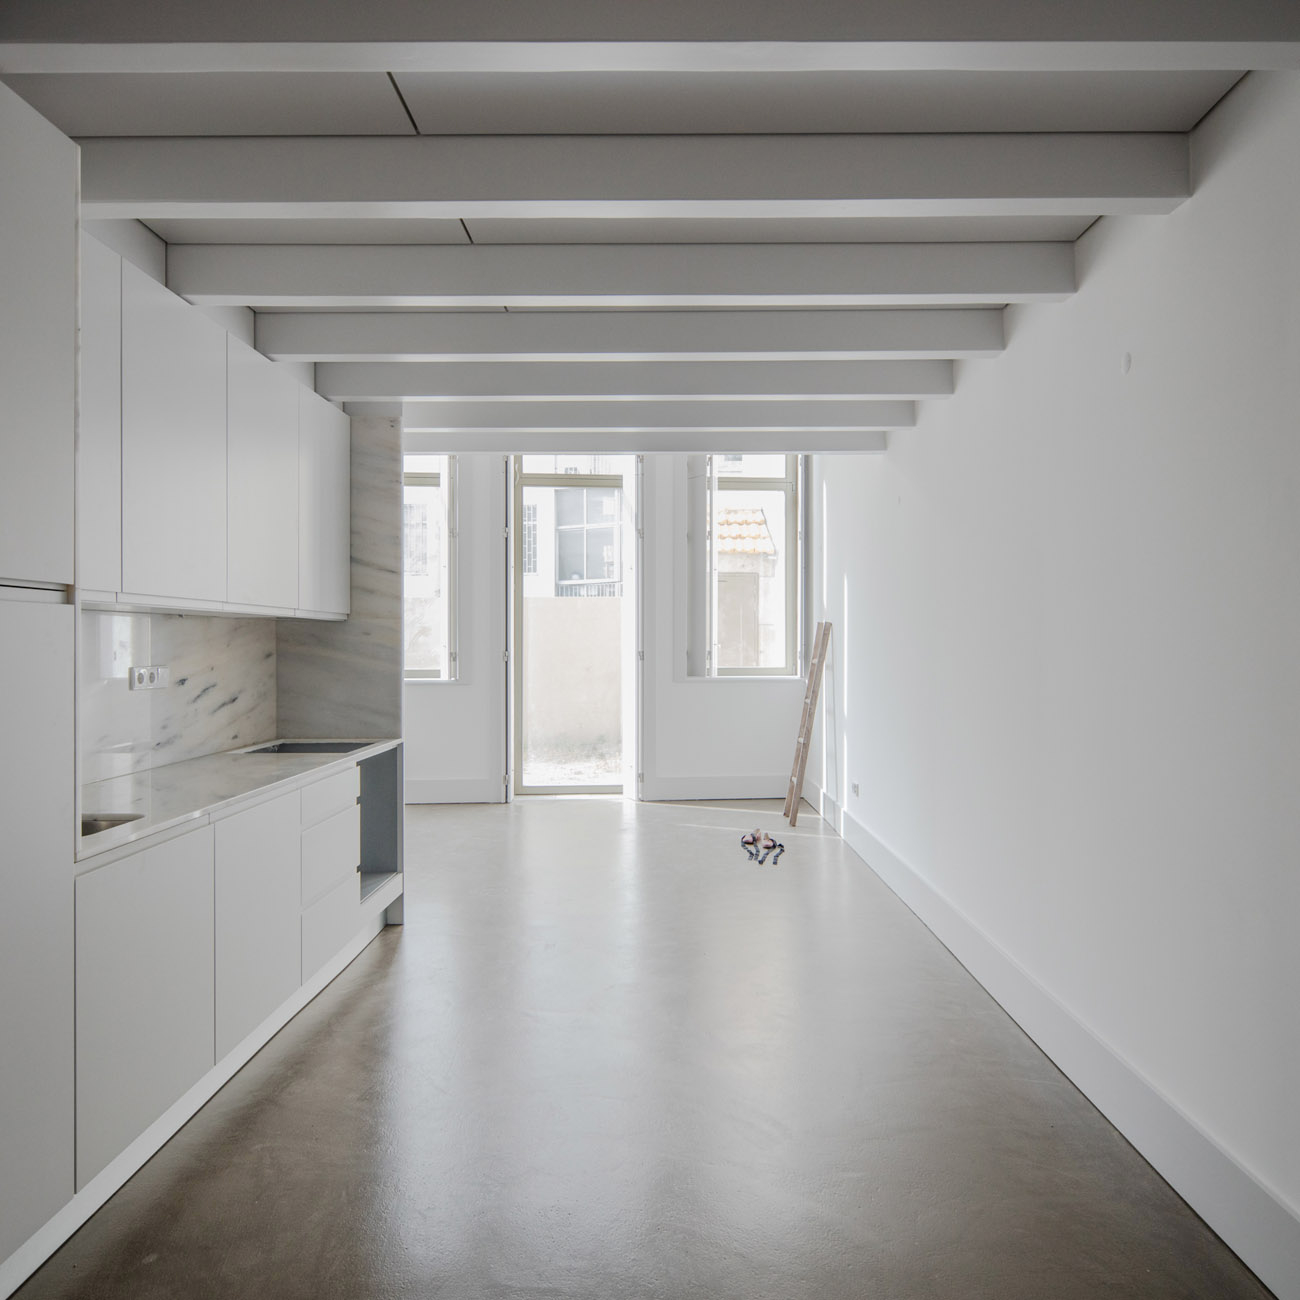 Pedro Ferreira Architecture Stu - thisispaper | ello